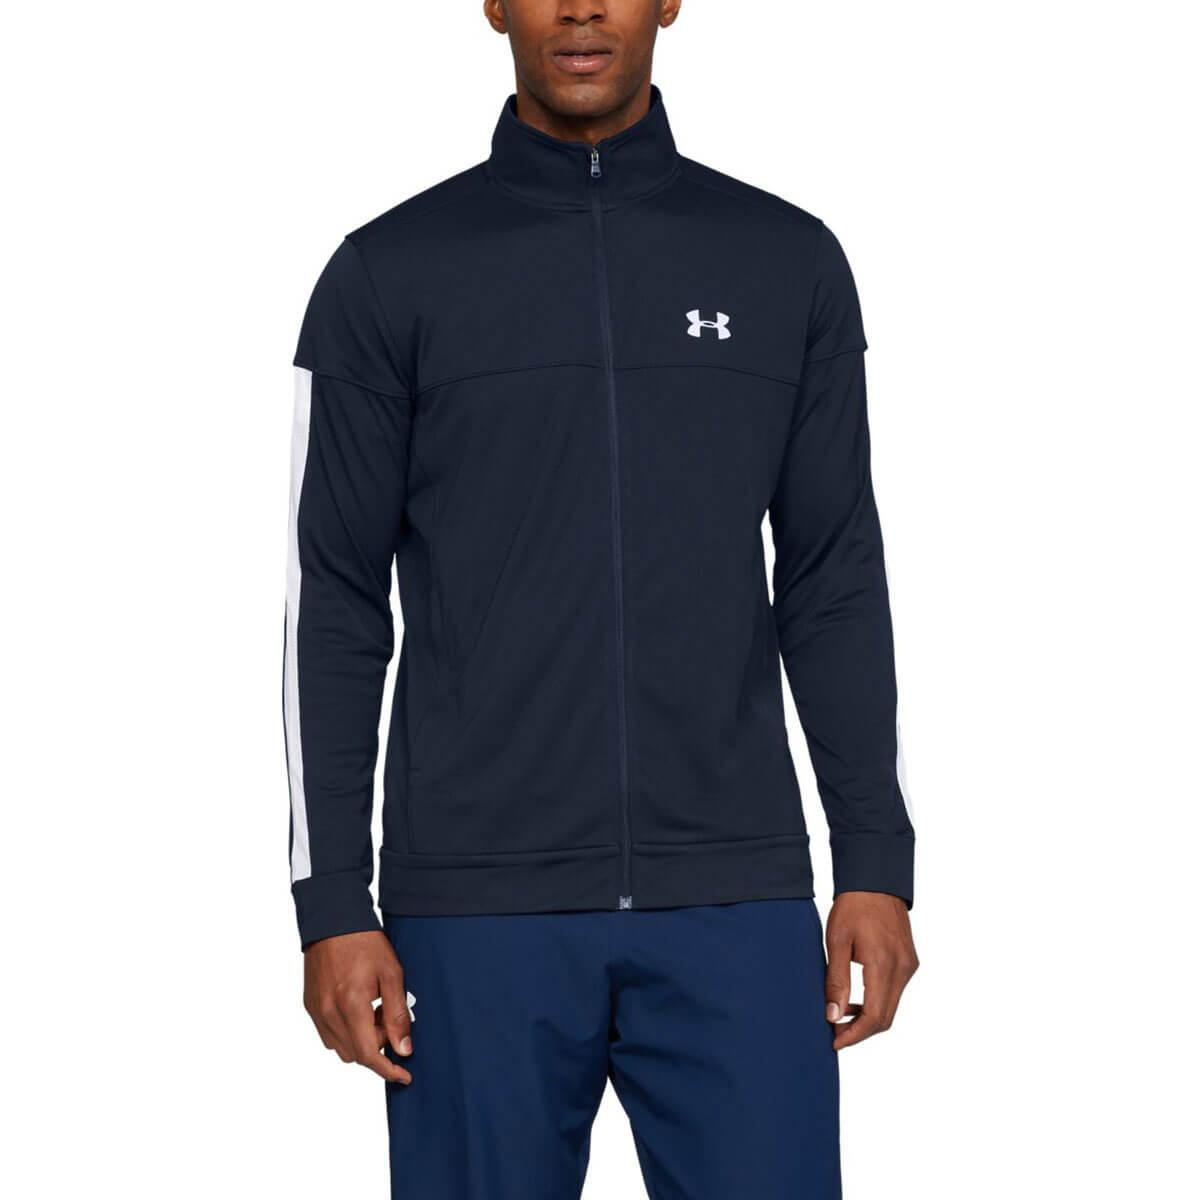 4fc480032 Under Armour Mens 2019 Sportstyle Pique Jacket